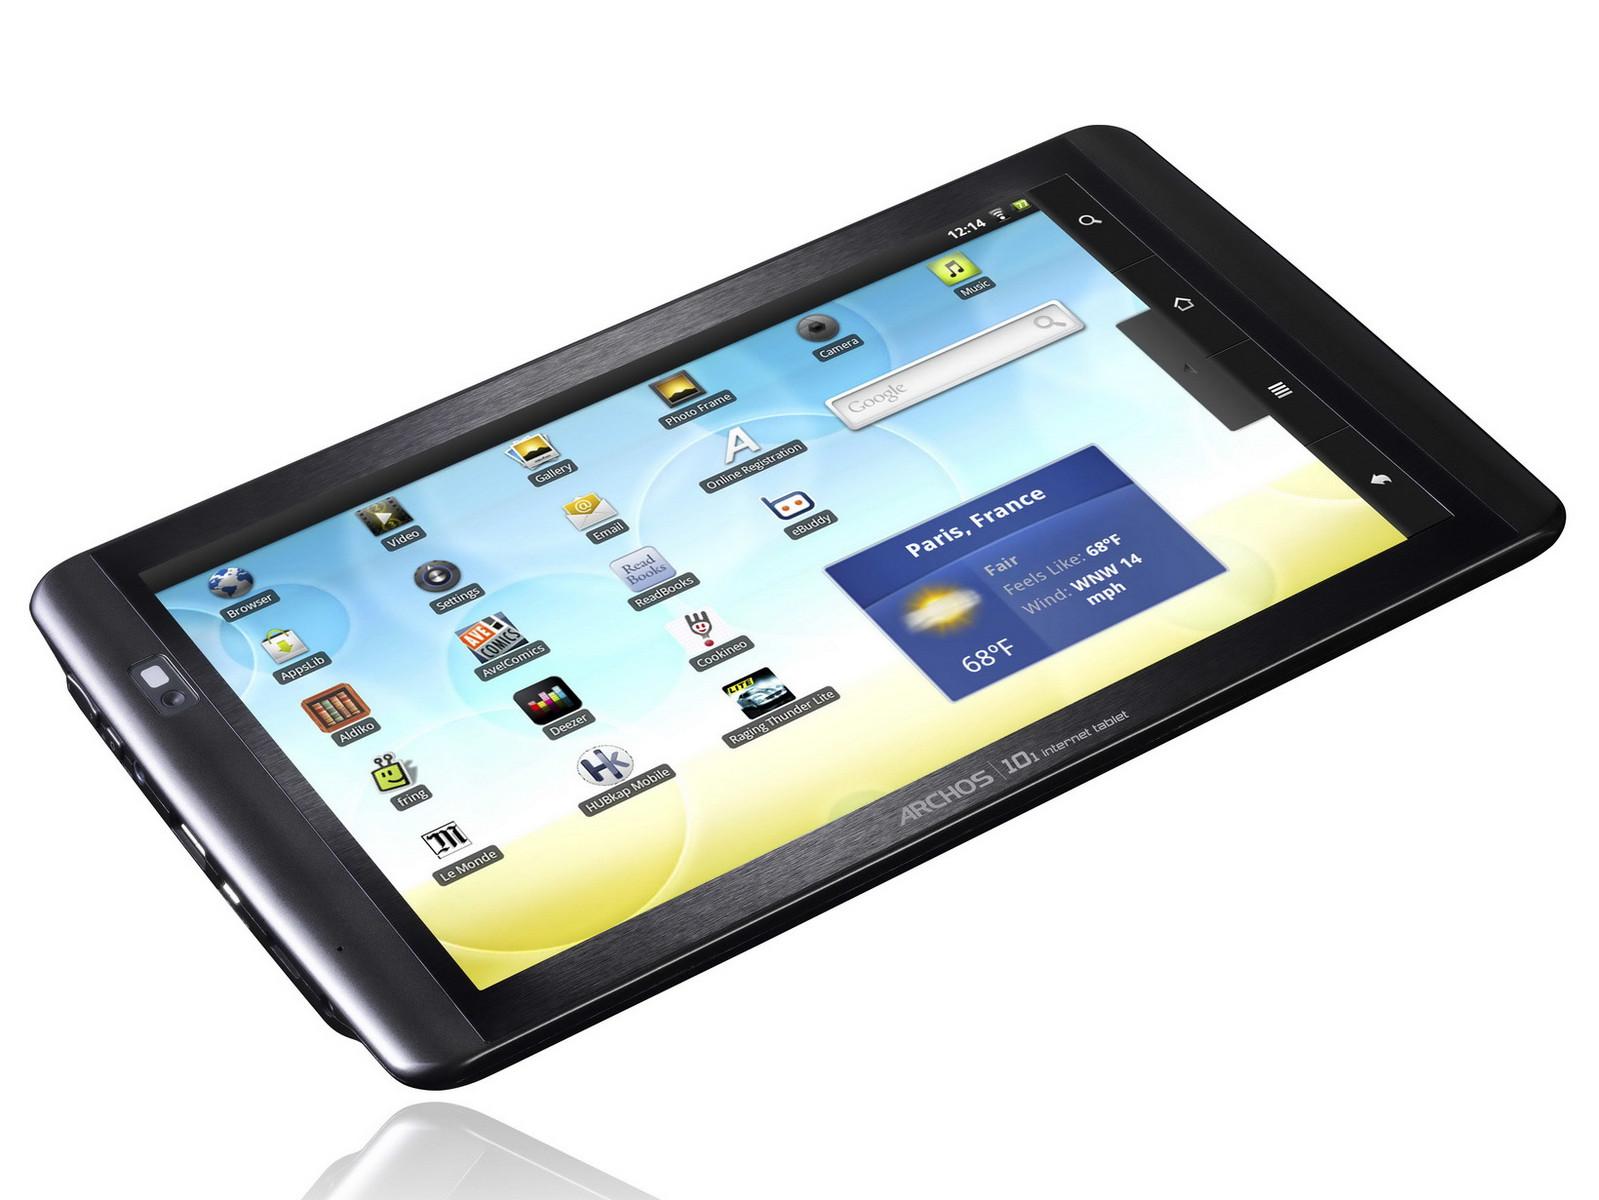 archos 101 internet tablet firmware 4.0